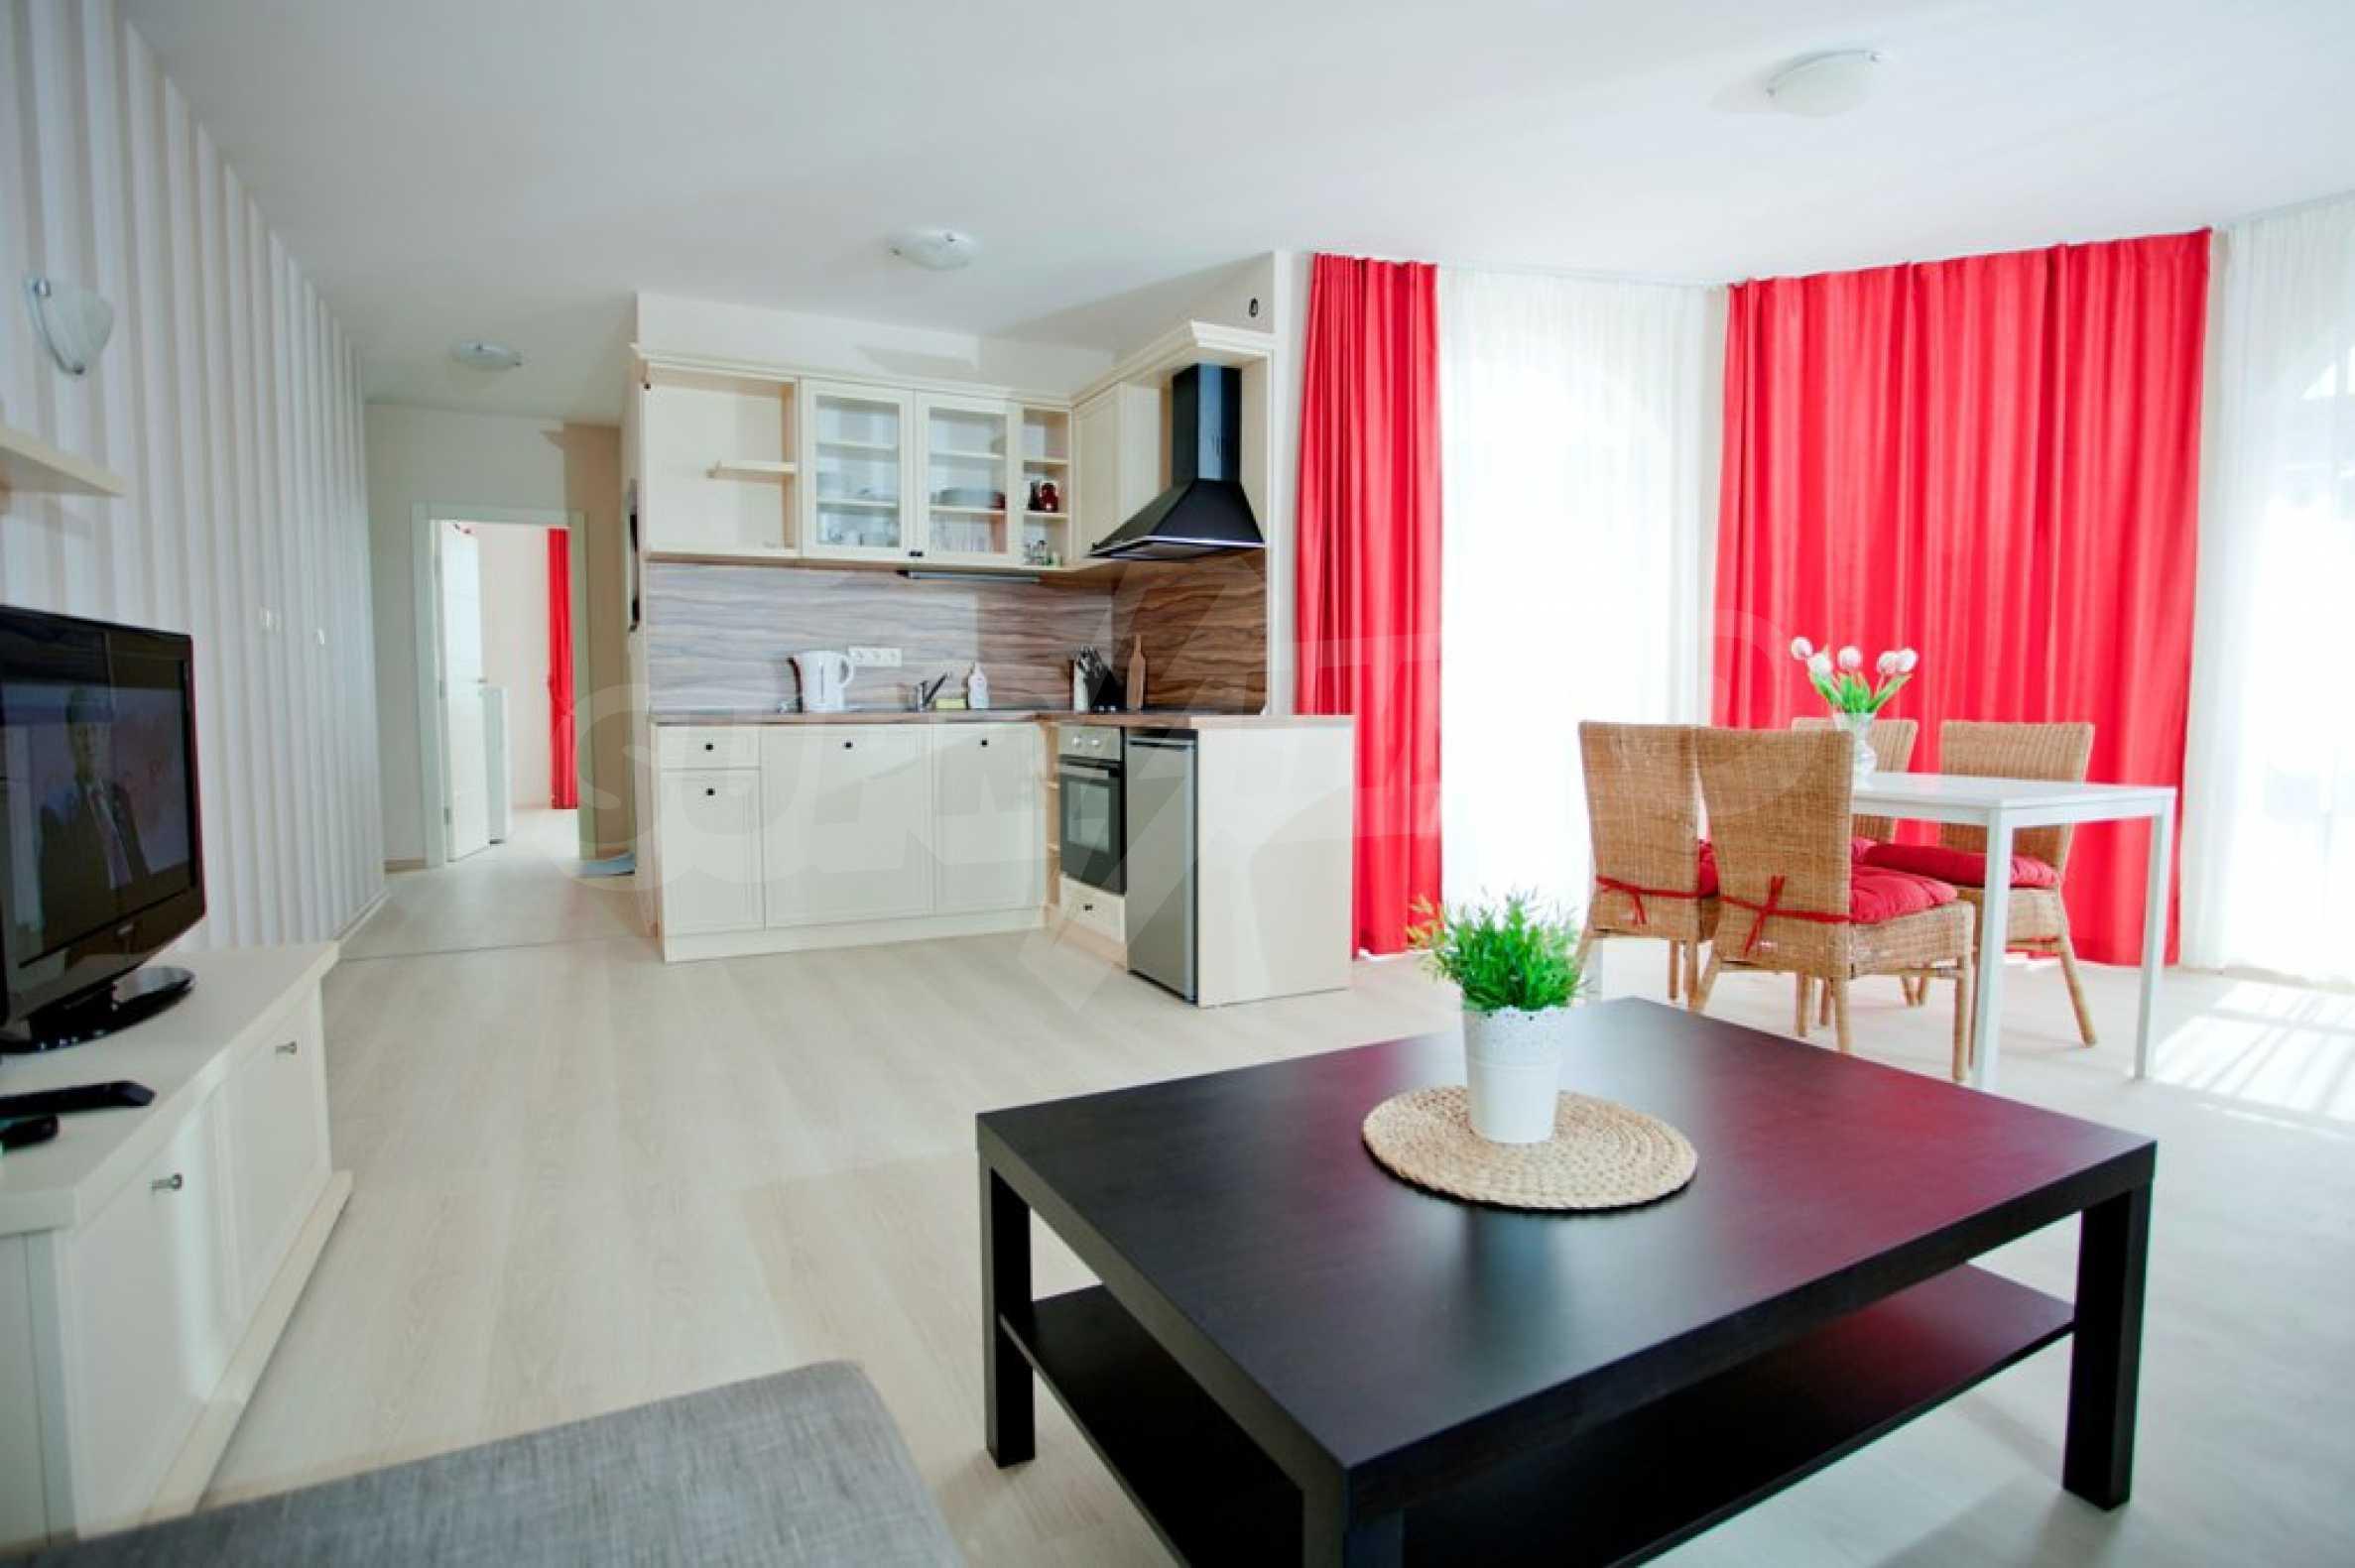 New apartment complex Atia resort in Chernomorets 23